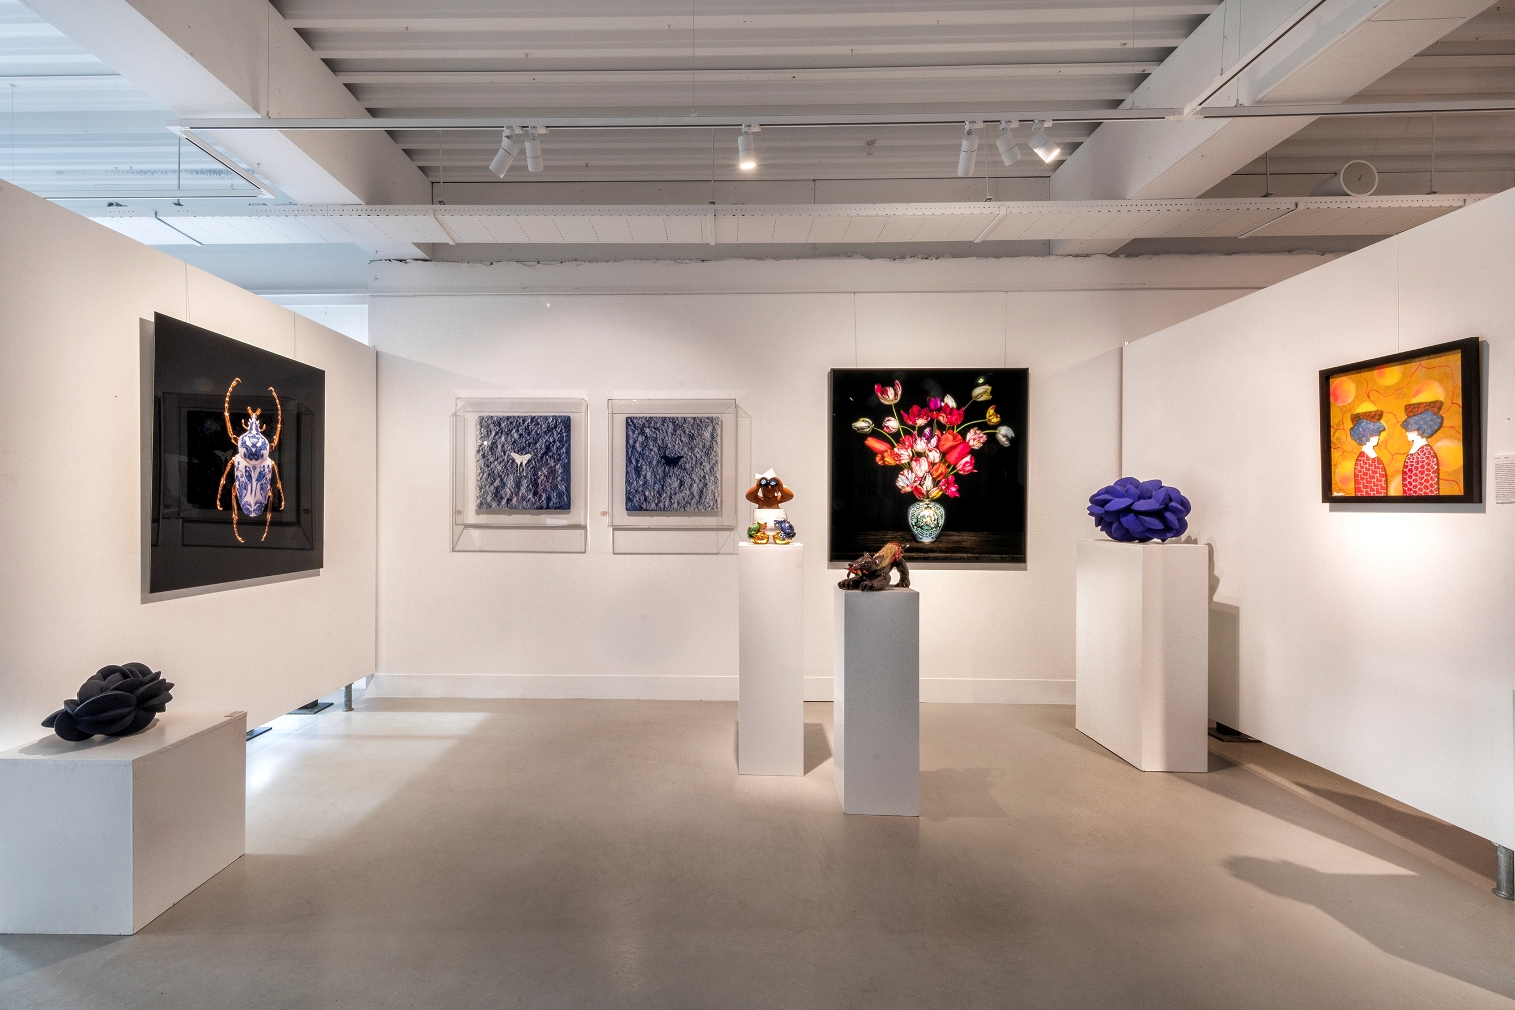 moderne kunstgalerij open op afspraak